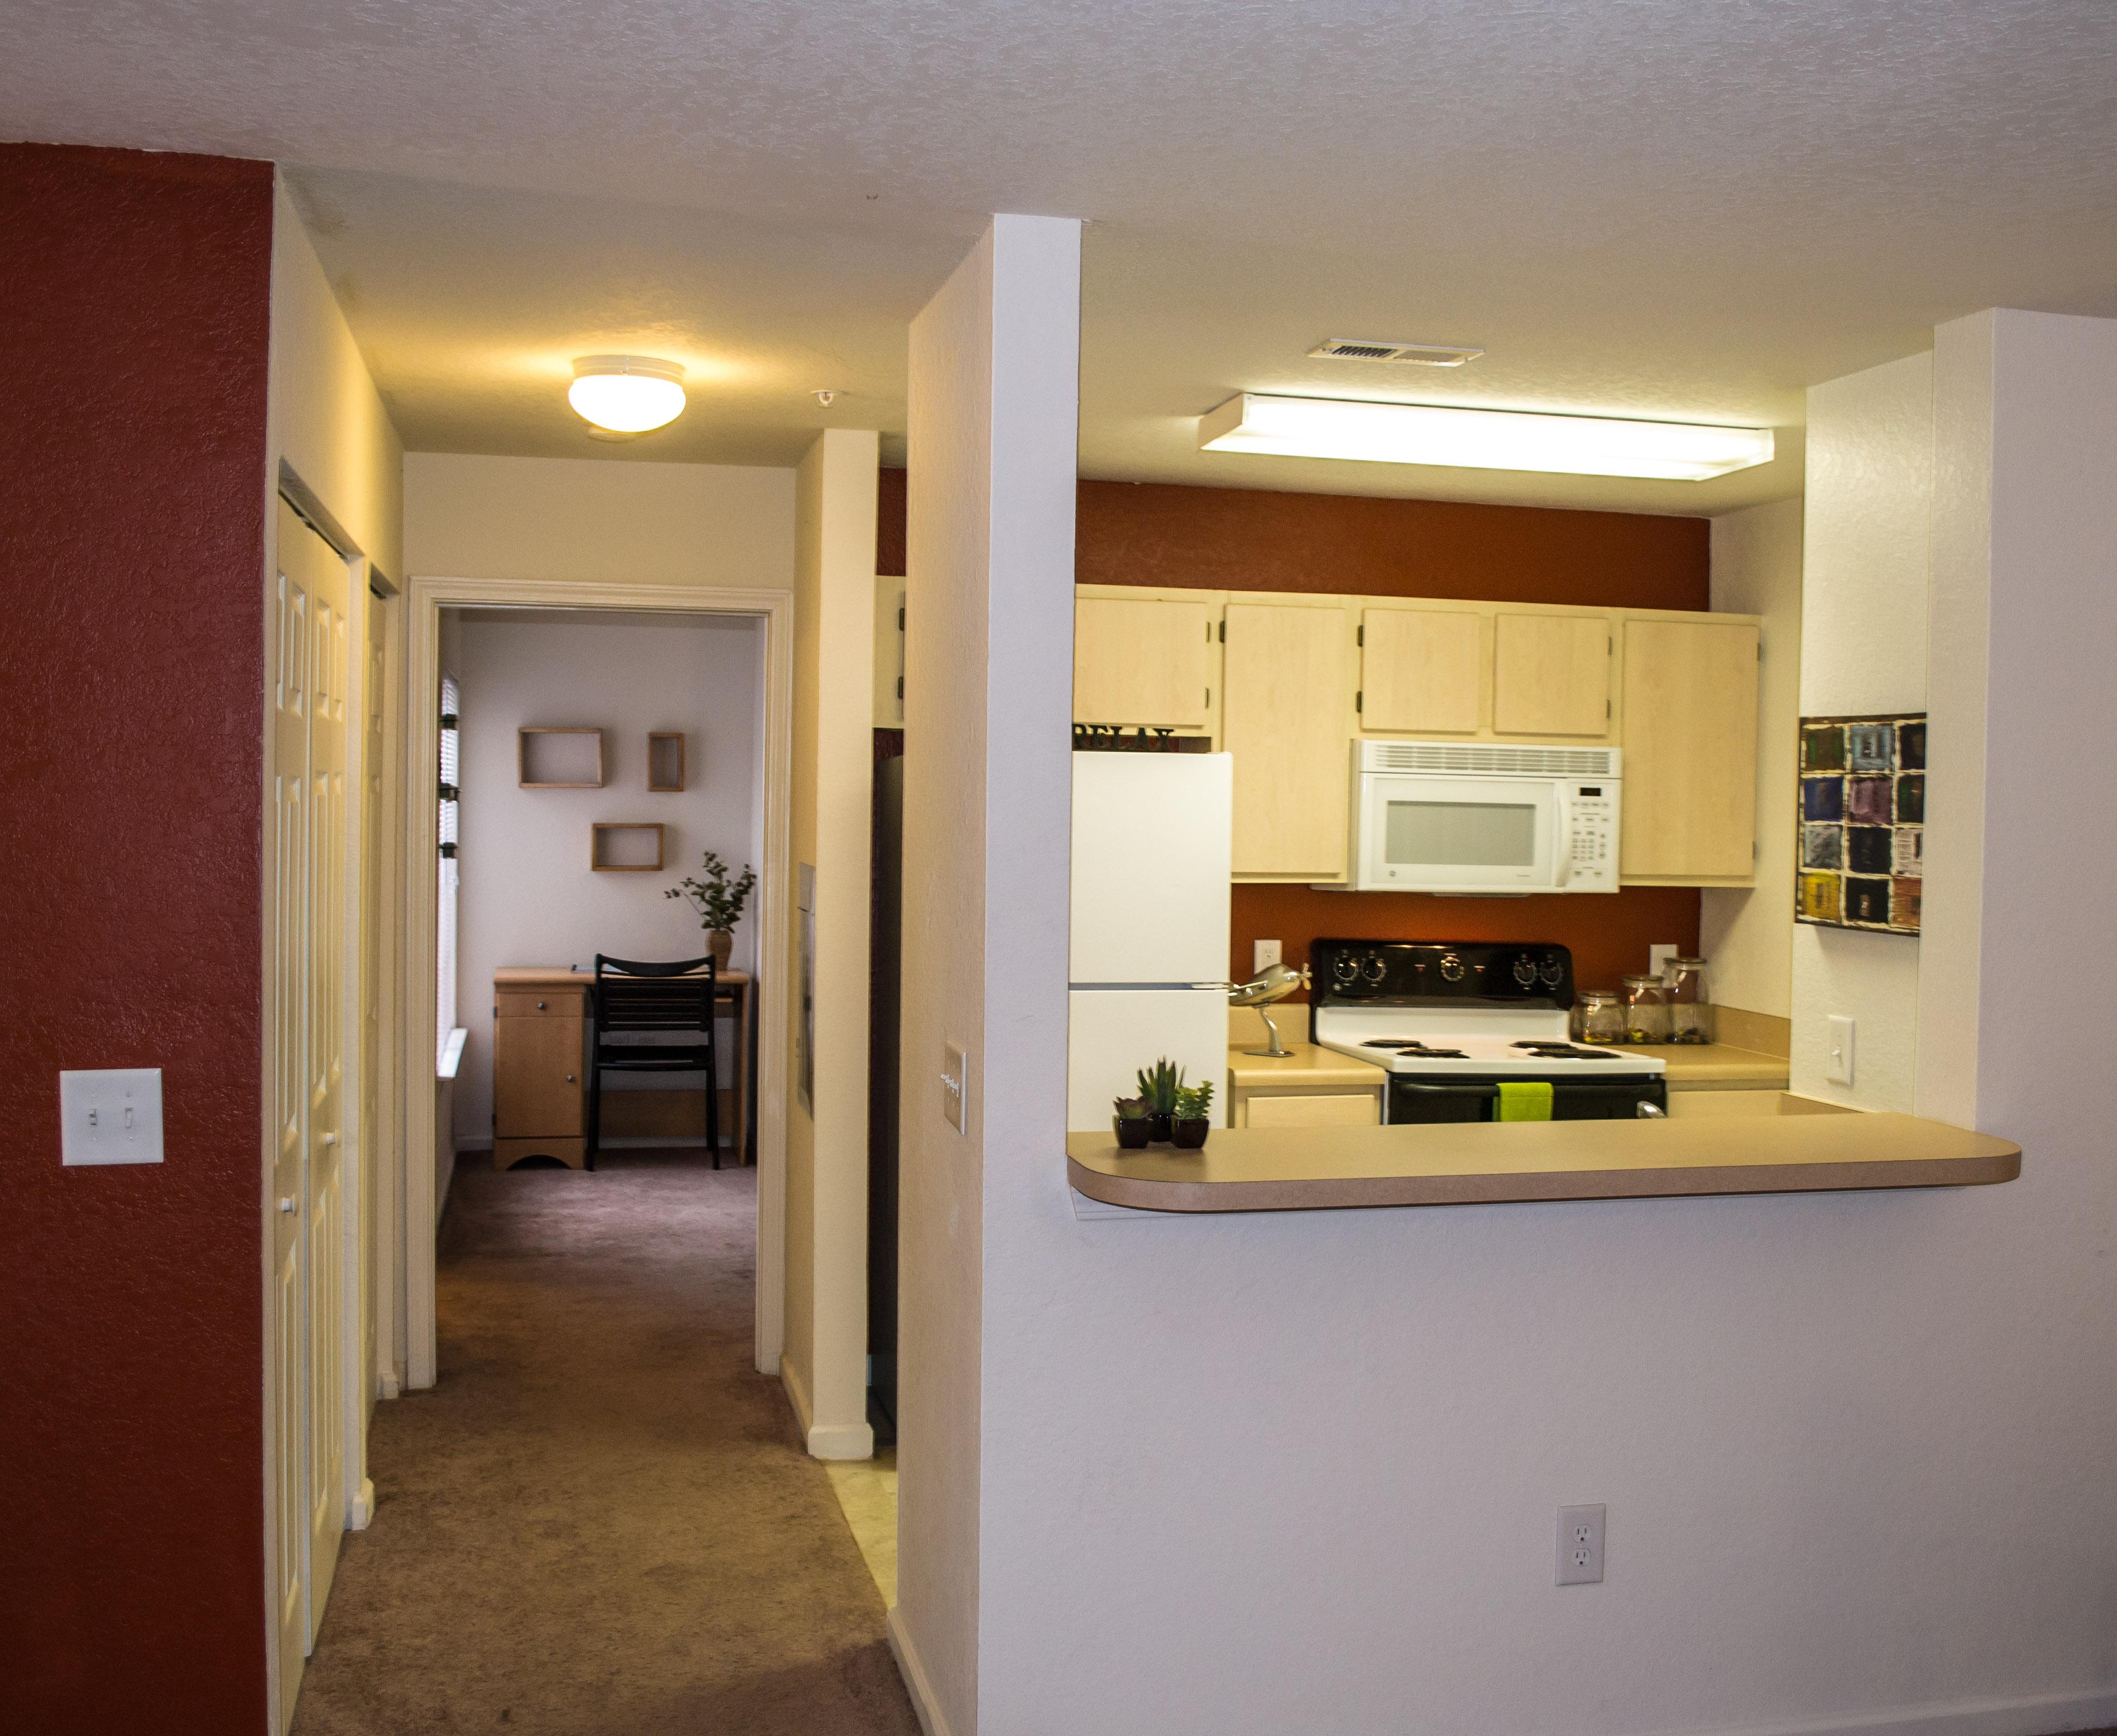 Village Green Apartments - uCribs